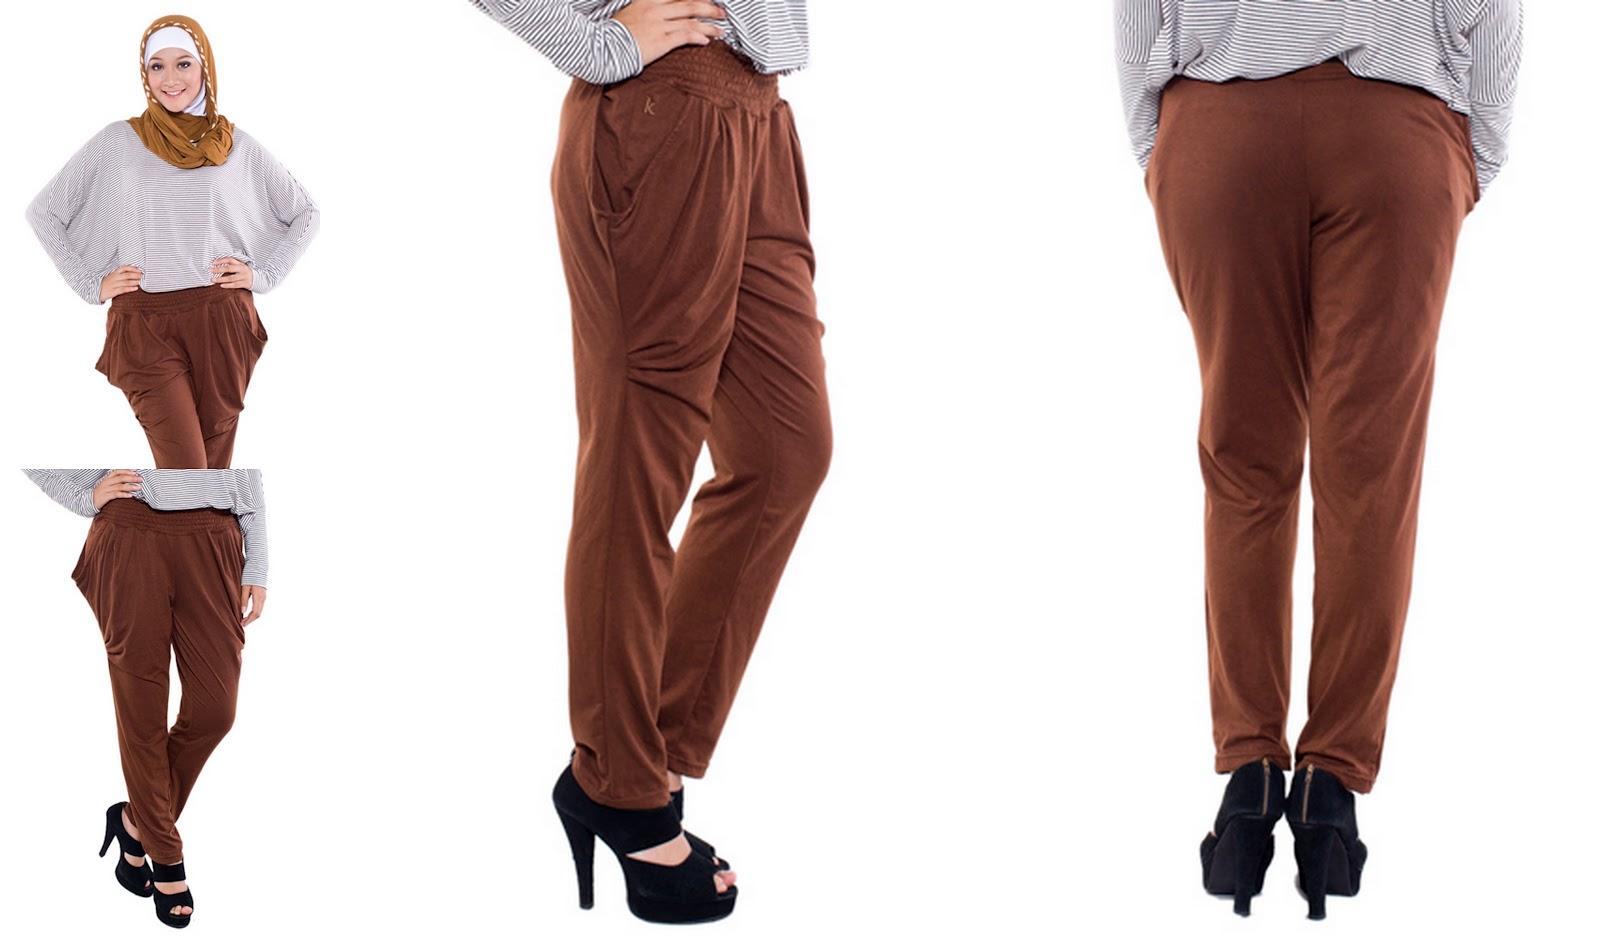 Download image Model Celana Panjang Wanita 2013 PC, Android, iPhone ...